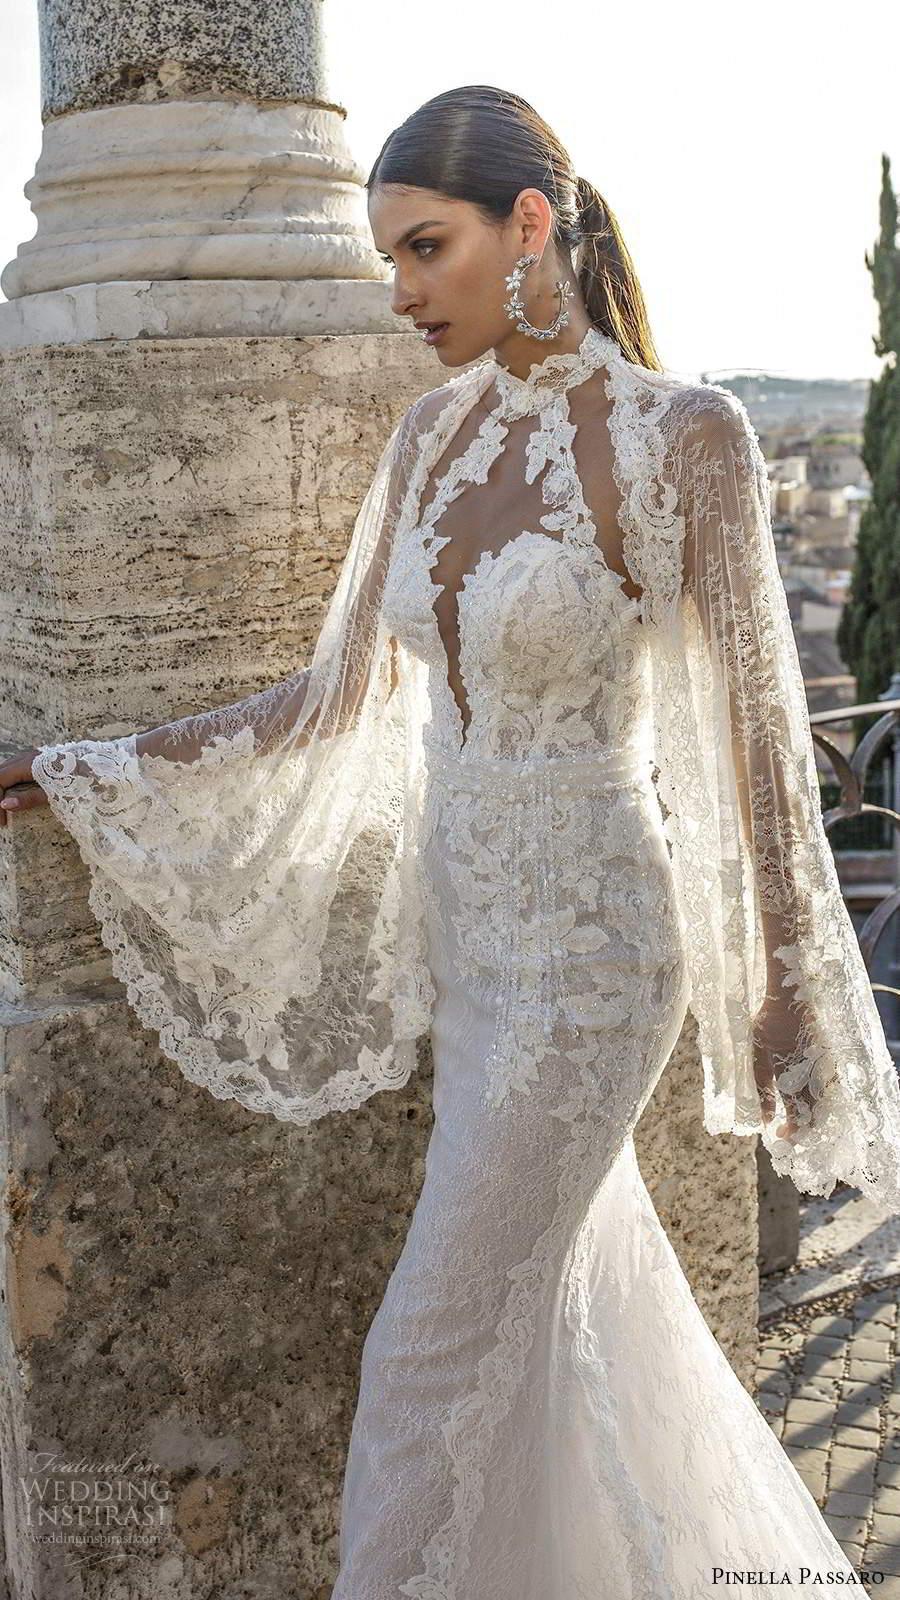 pinella passaro 2020 bridal illusion flare long sleeves high neckline plunging sweetheart bodice fully embellished lace sheath wedding dress sheer back cathedral train (3) mv